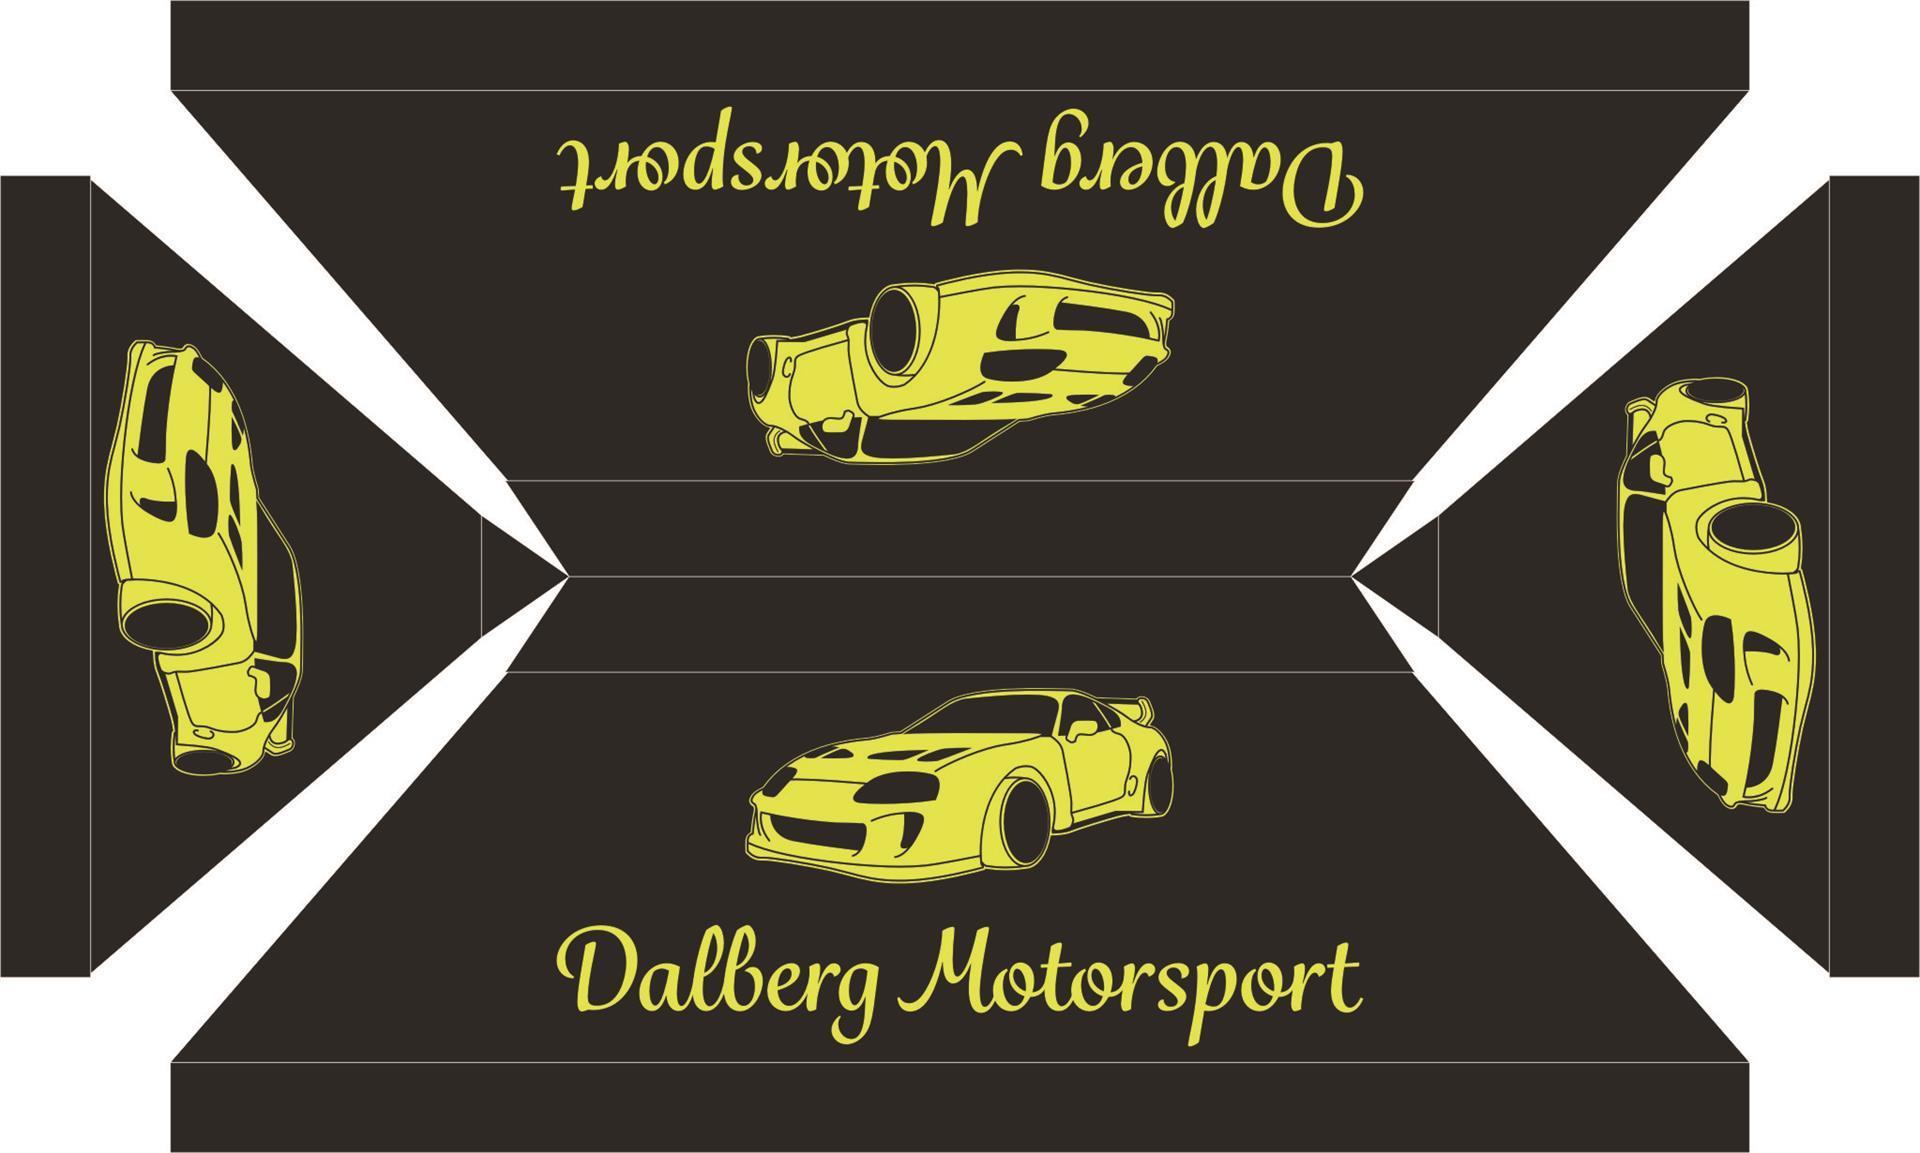 Dalberg Motorsport